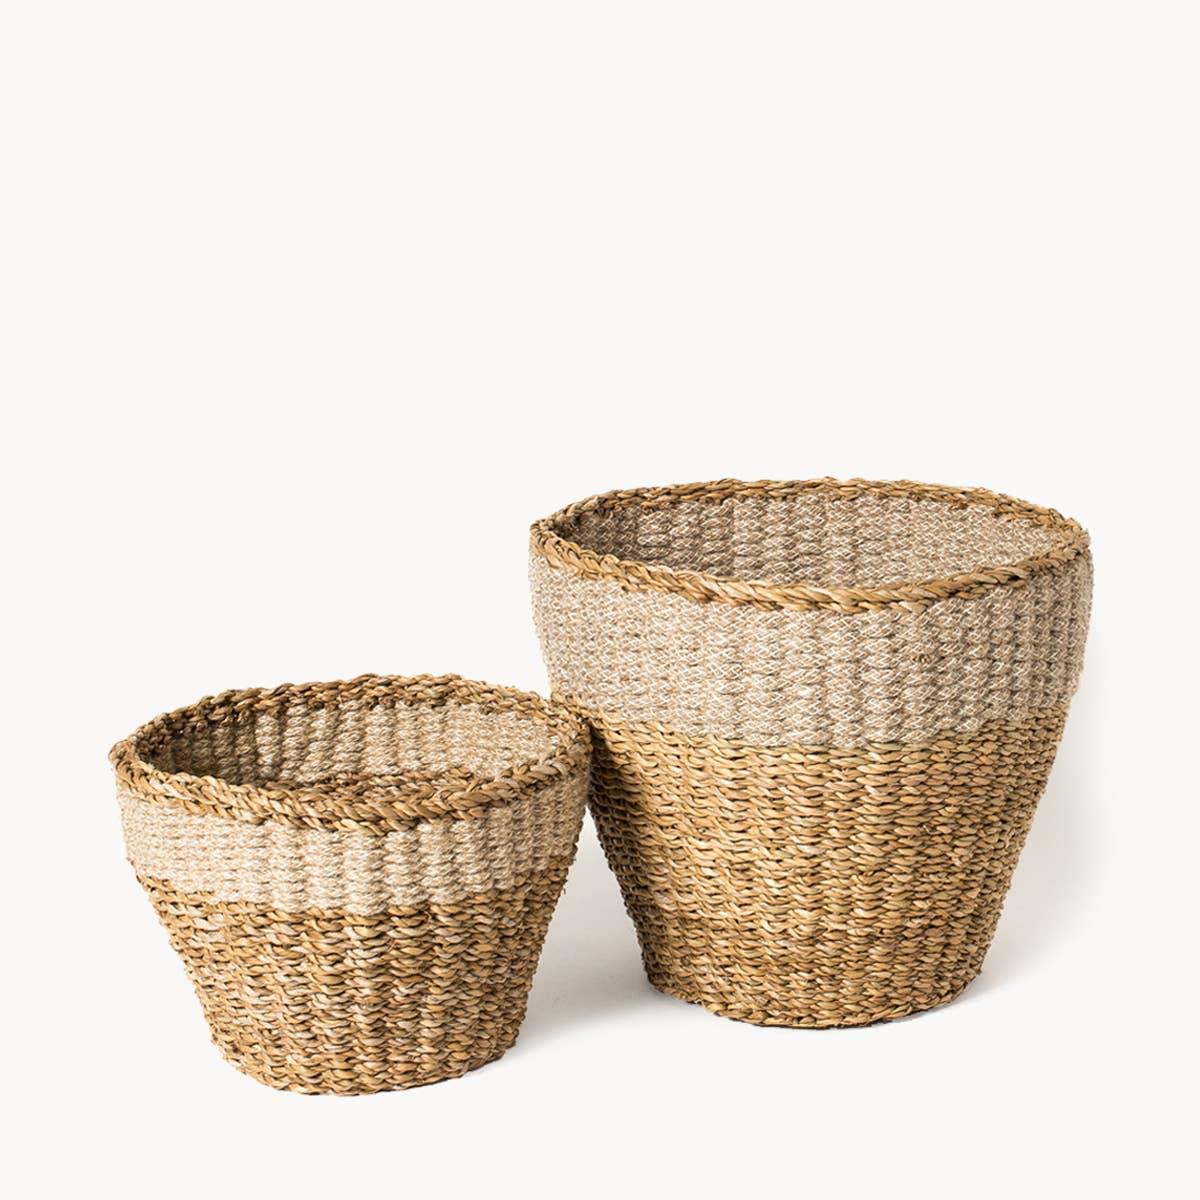 Savar Planter (Set of 2) | Trada Marketplace